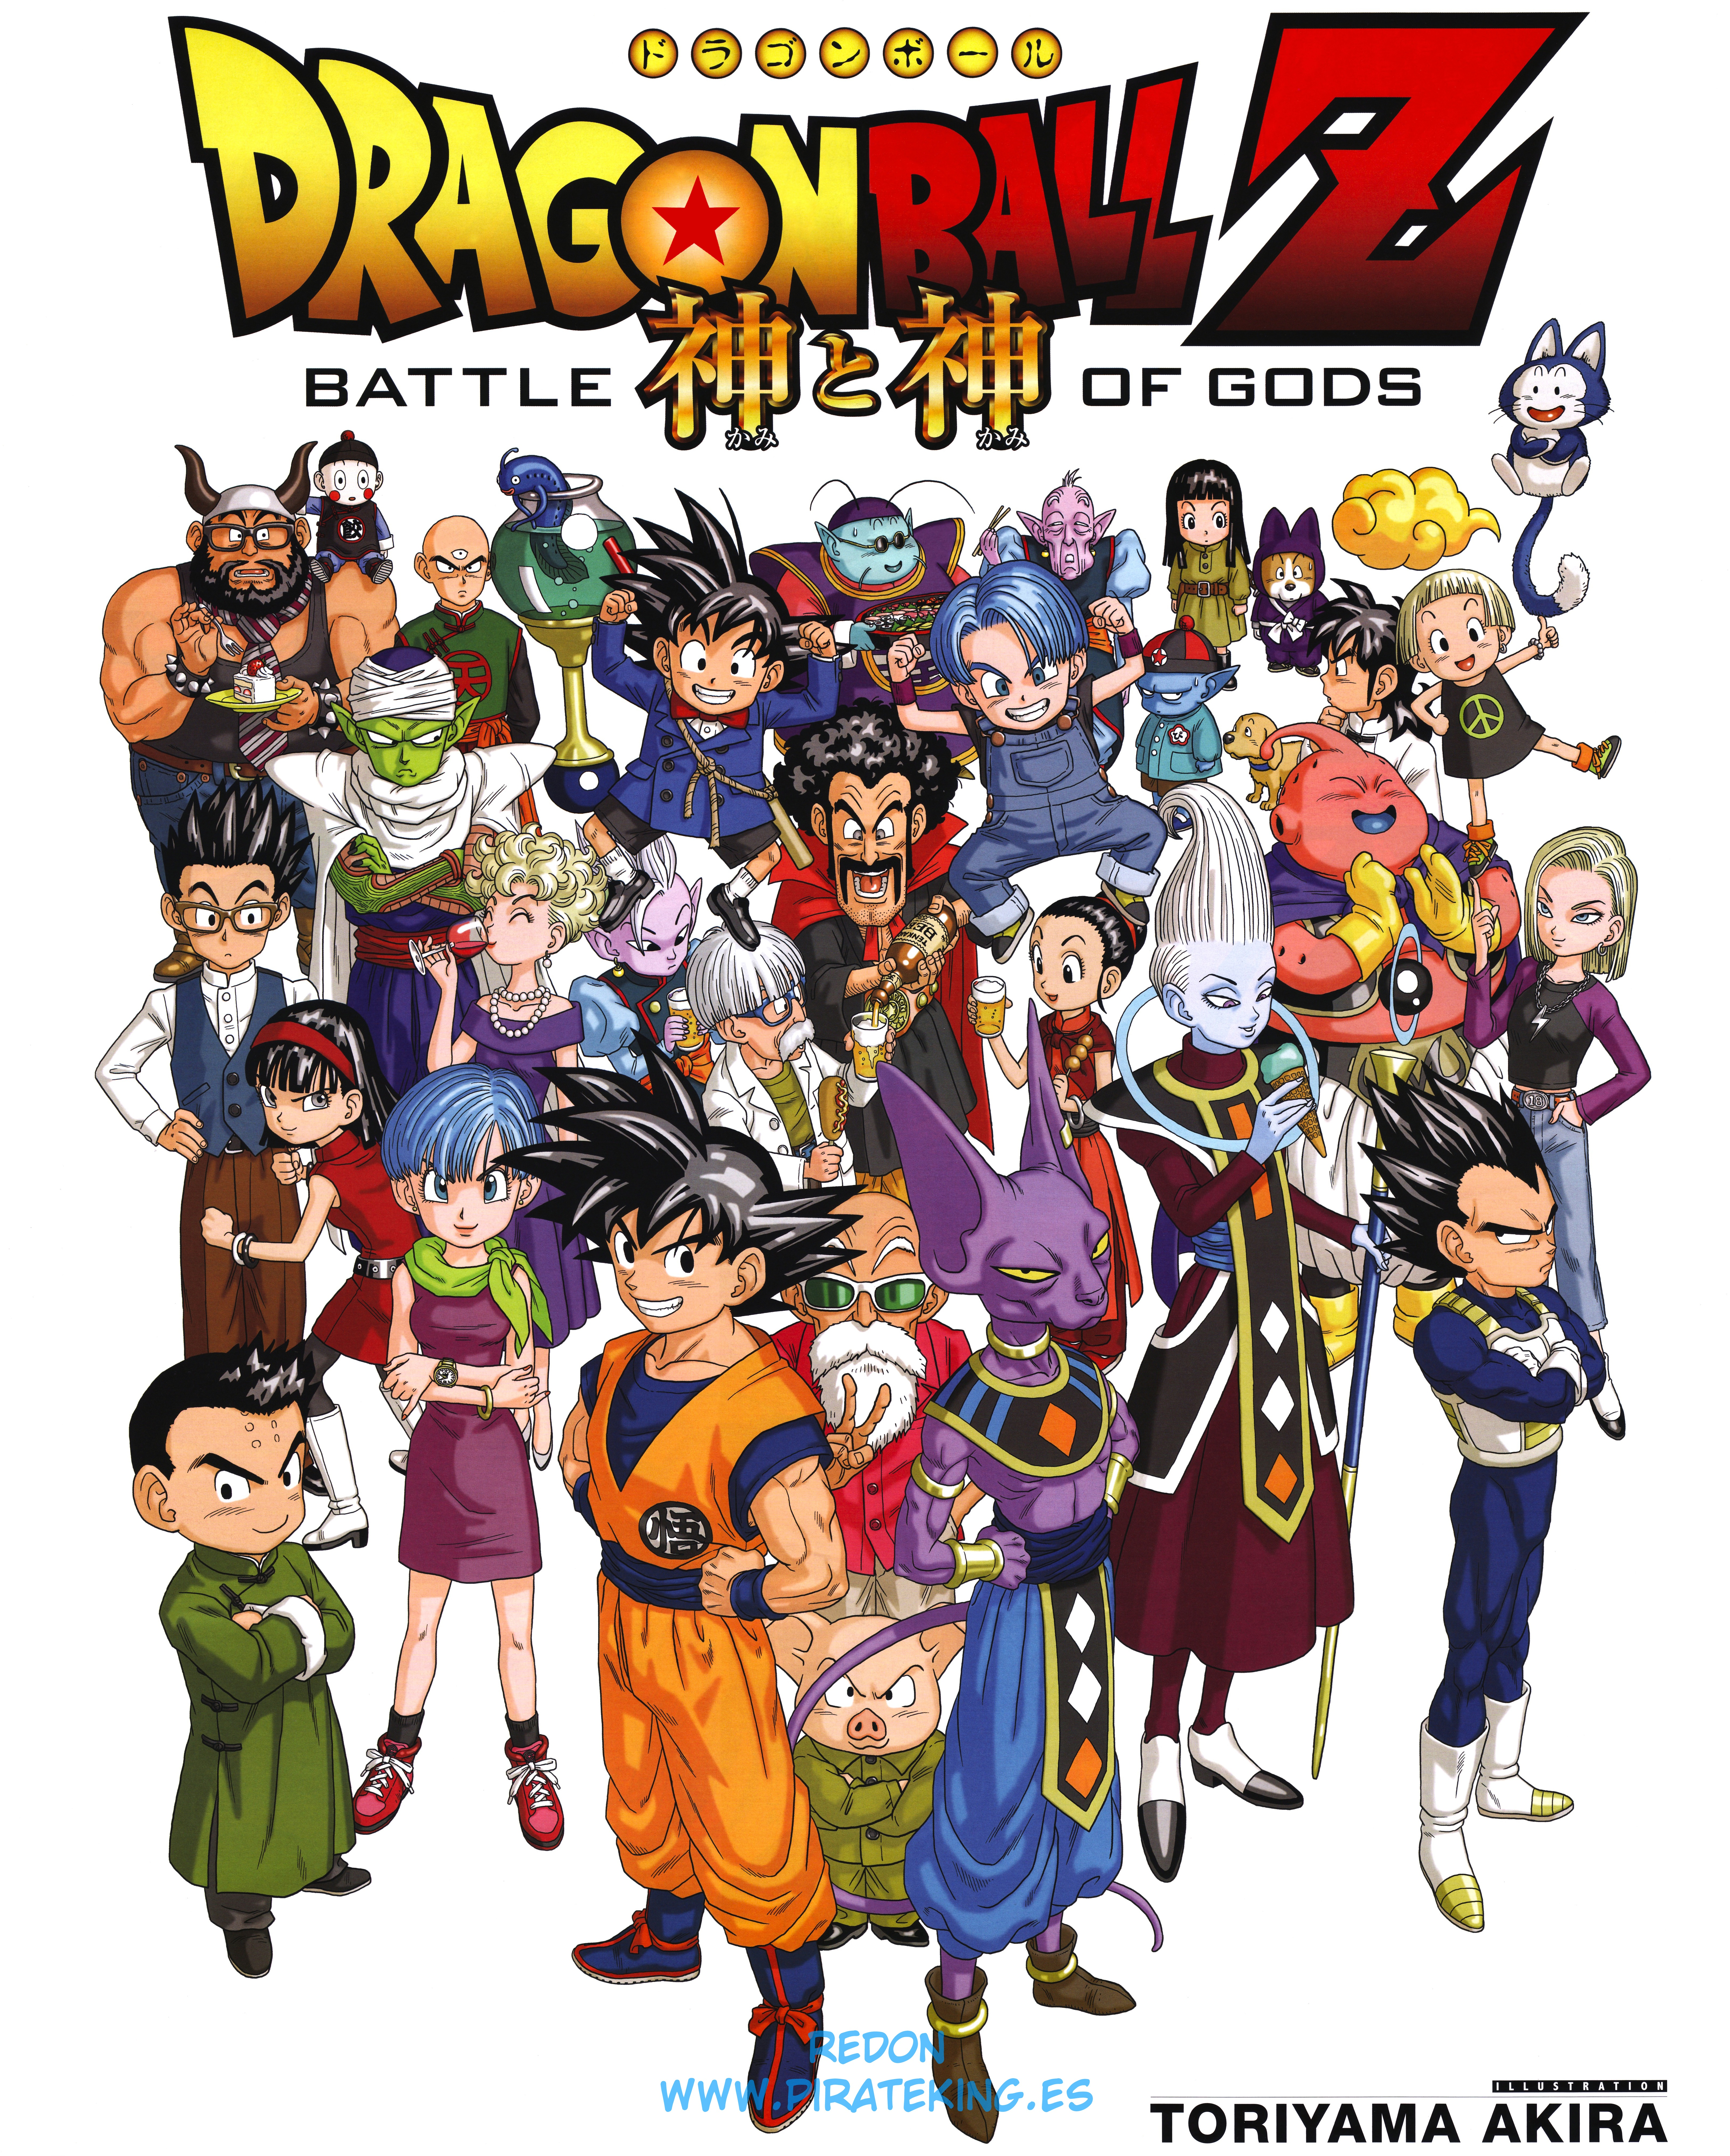 !Dragon Ball Z: Battle of Gods llegara oficialmente a America Latina! - Página 4 Ilustracion_toriyama_01